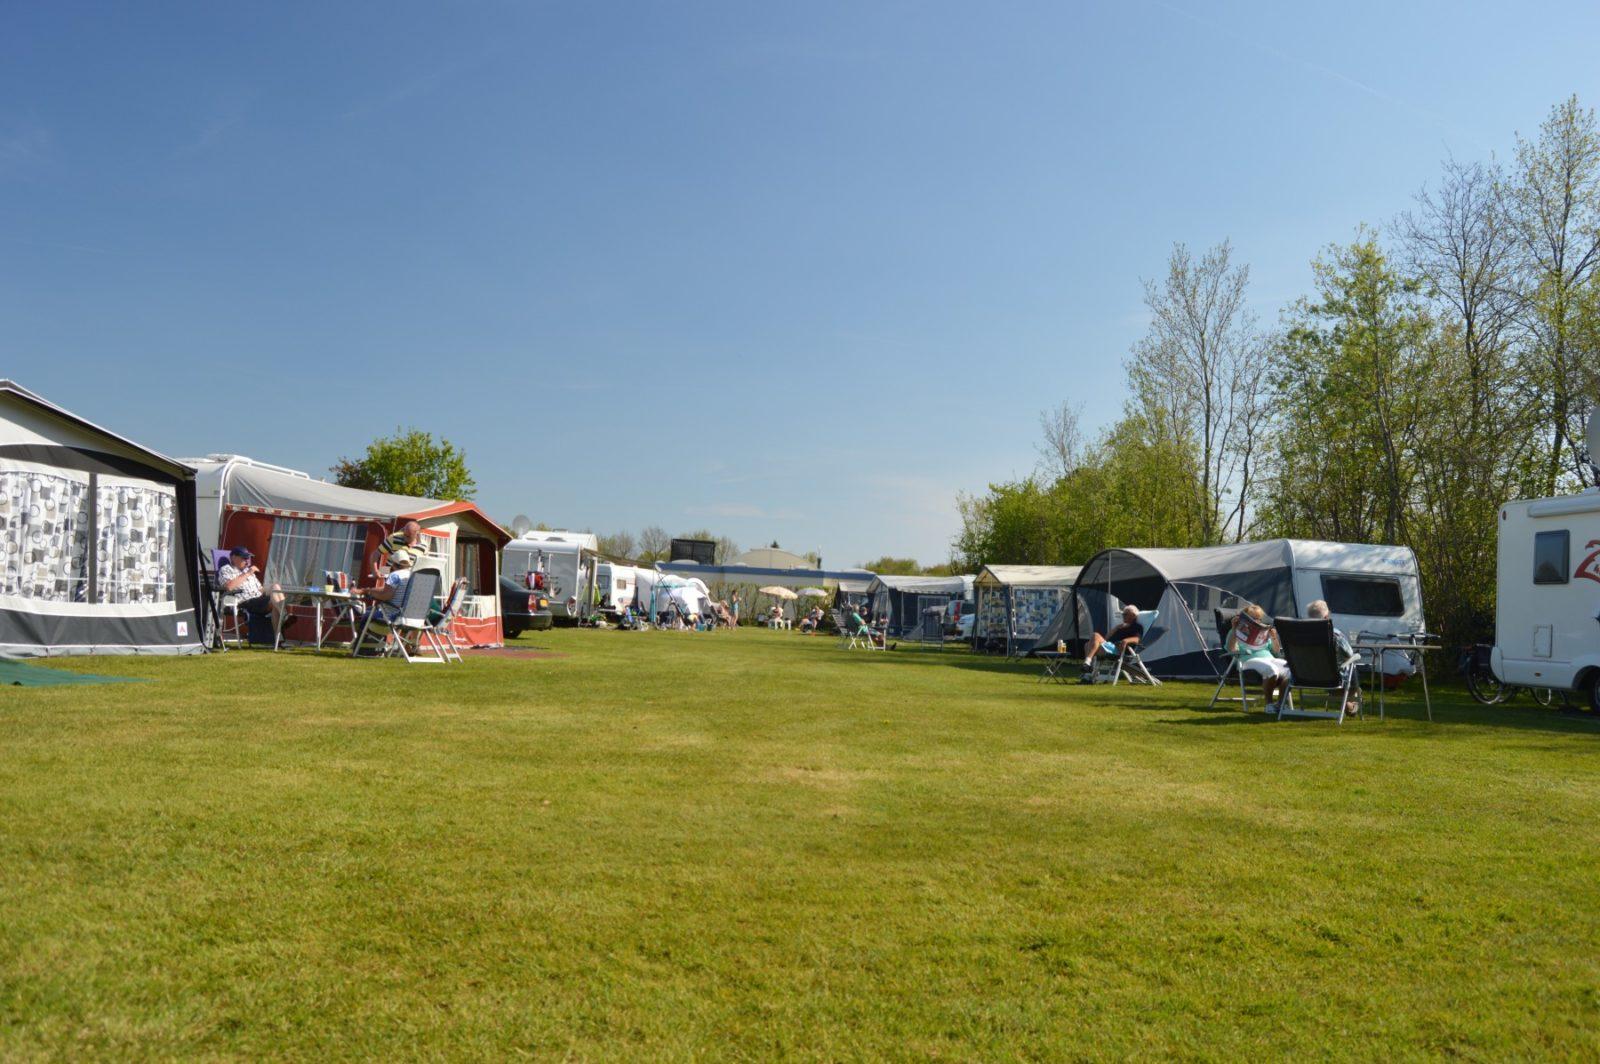 camping-rotandorp-drenthe-friesland 2